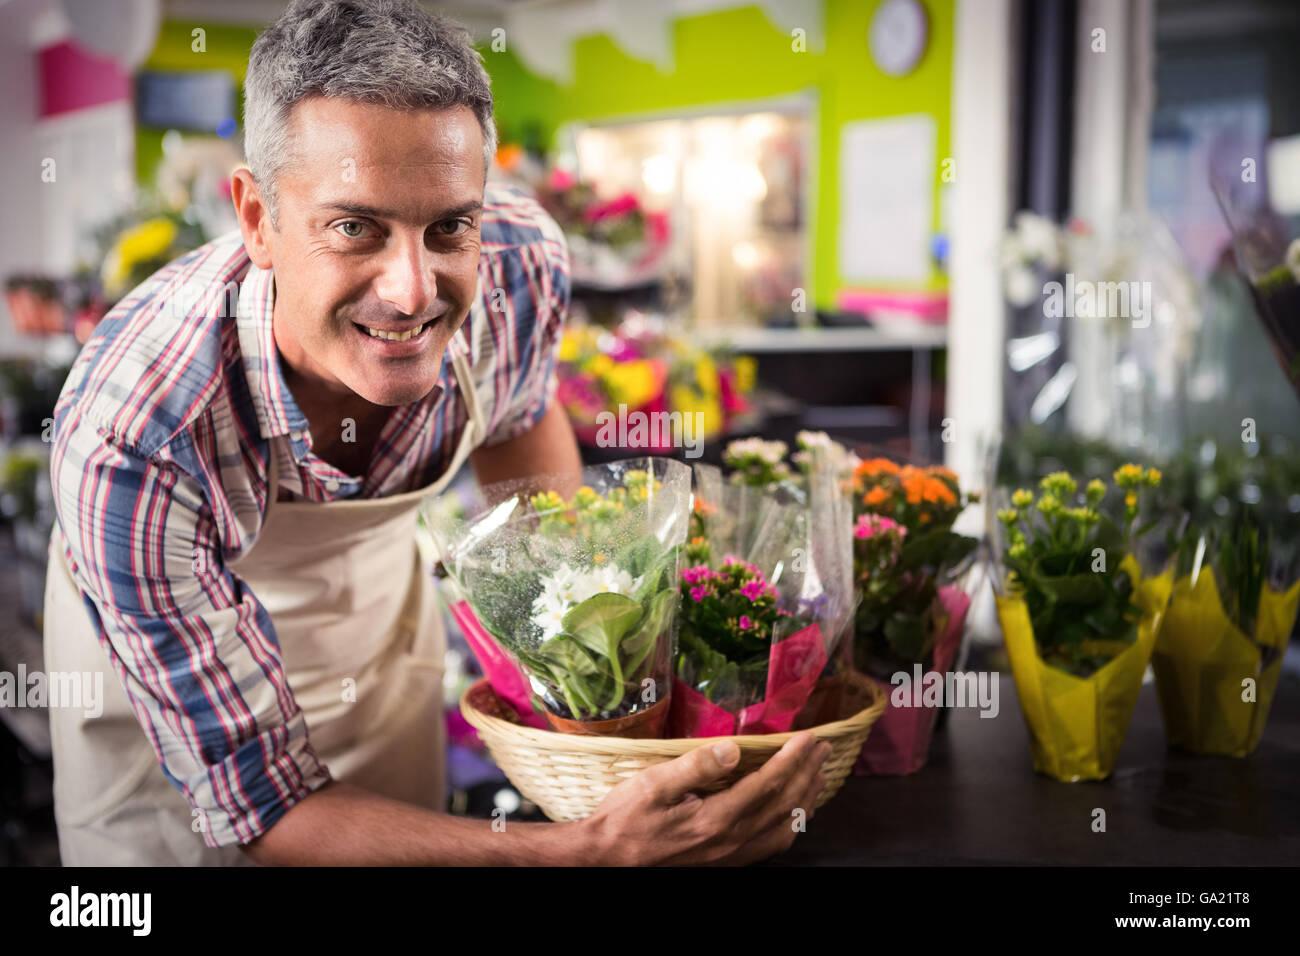 Male florist arranging bouquet of flower - Stock Image